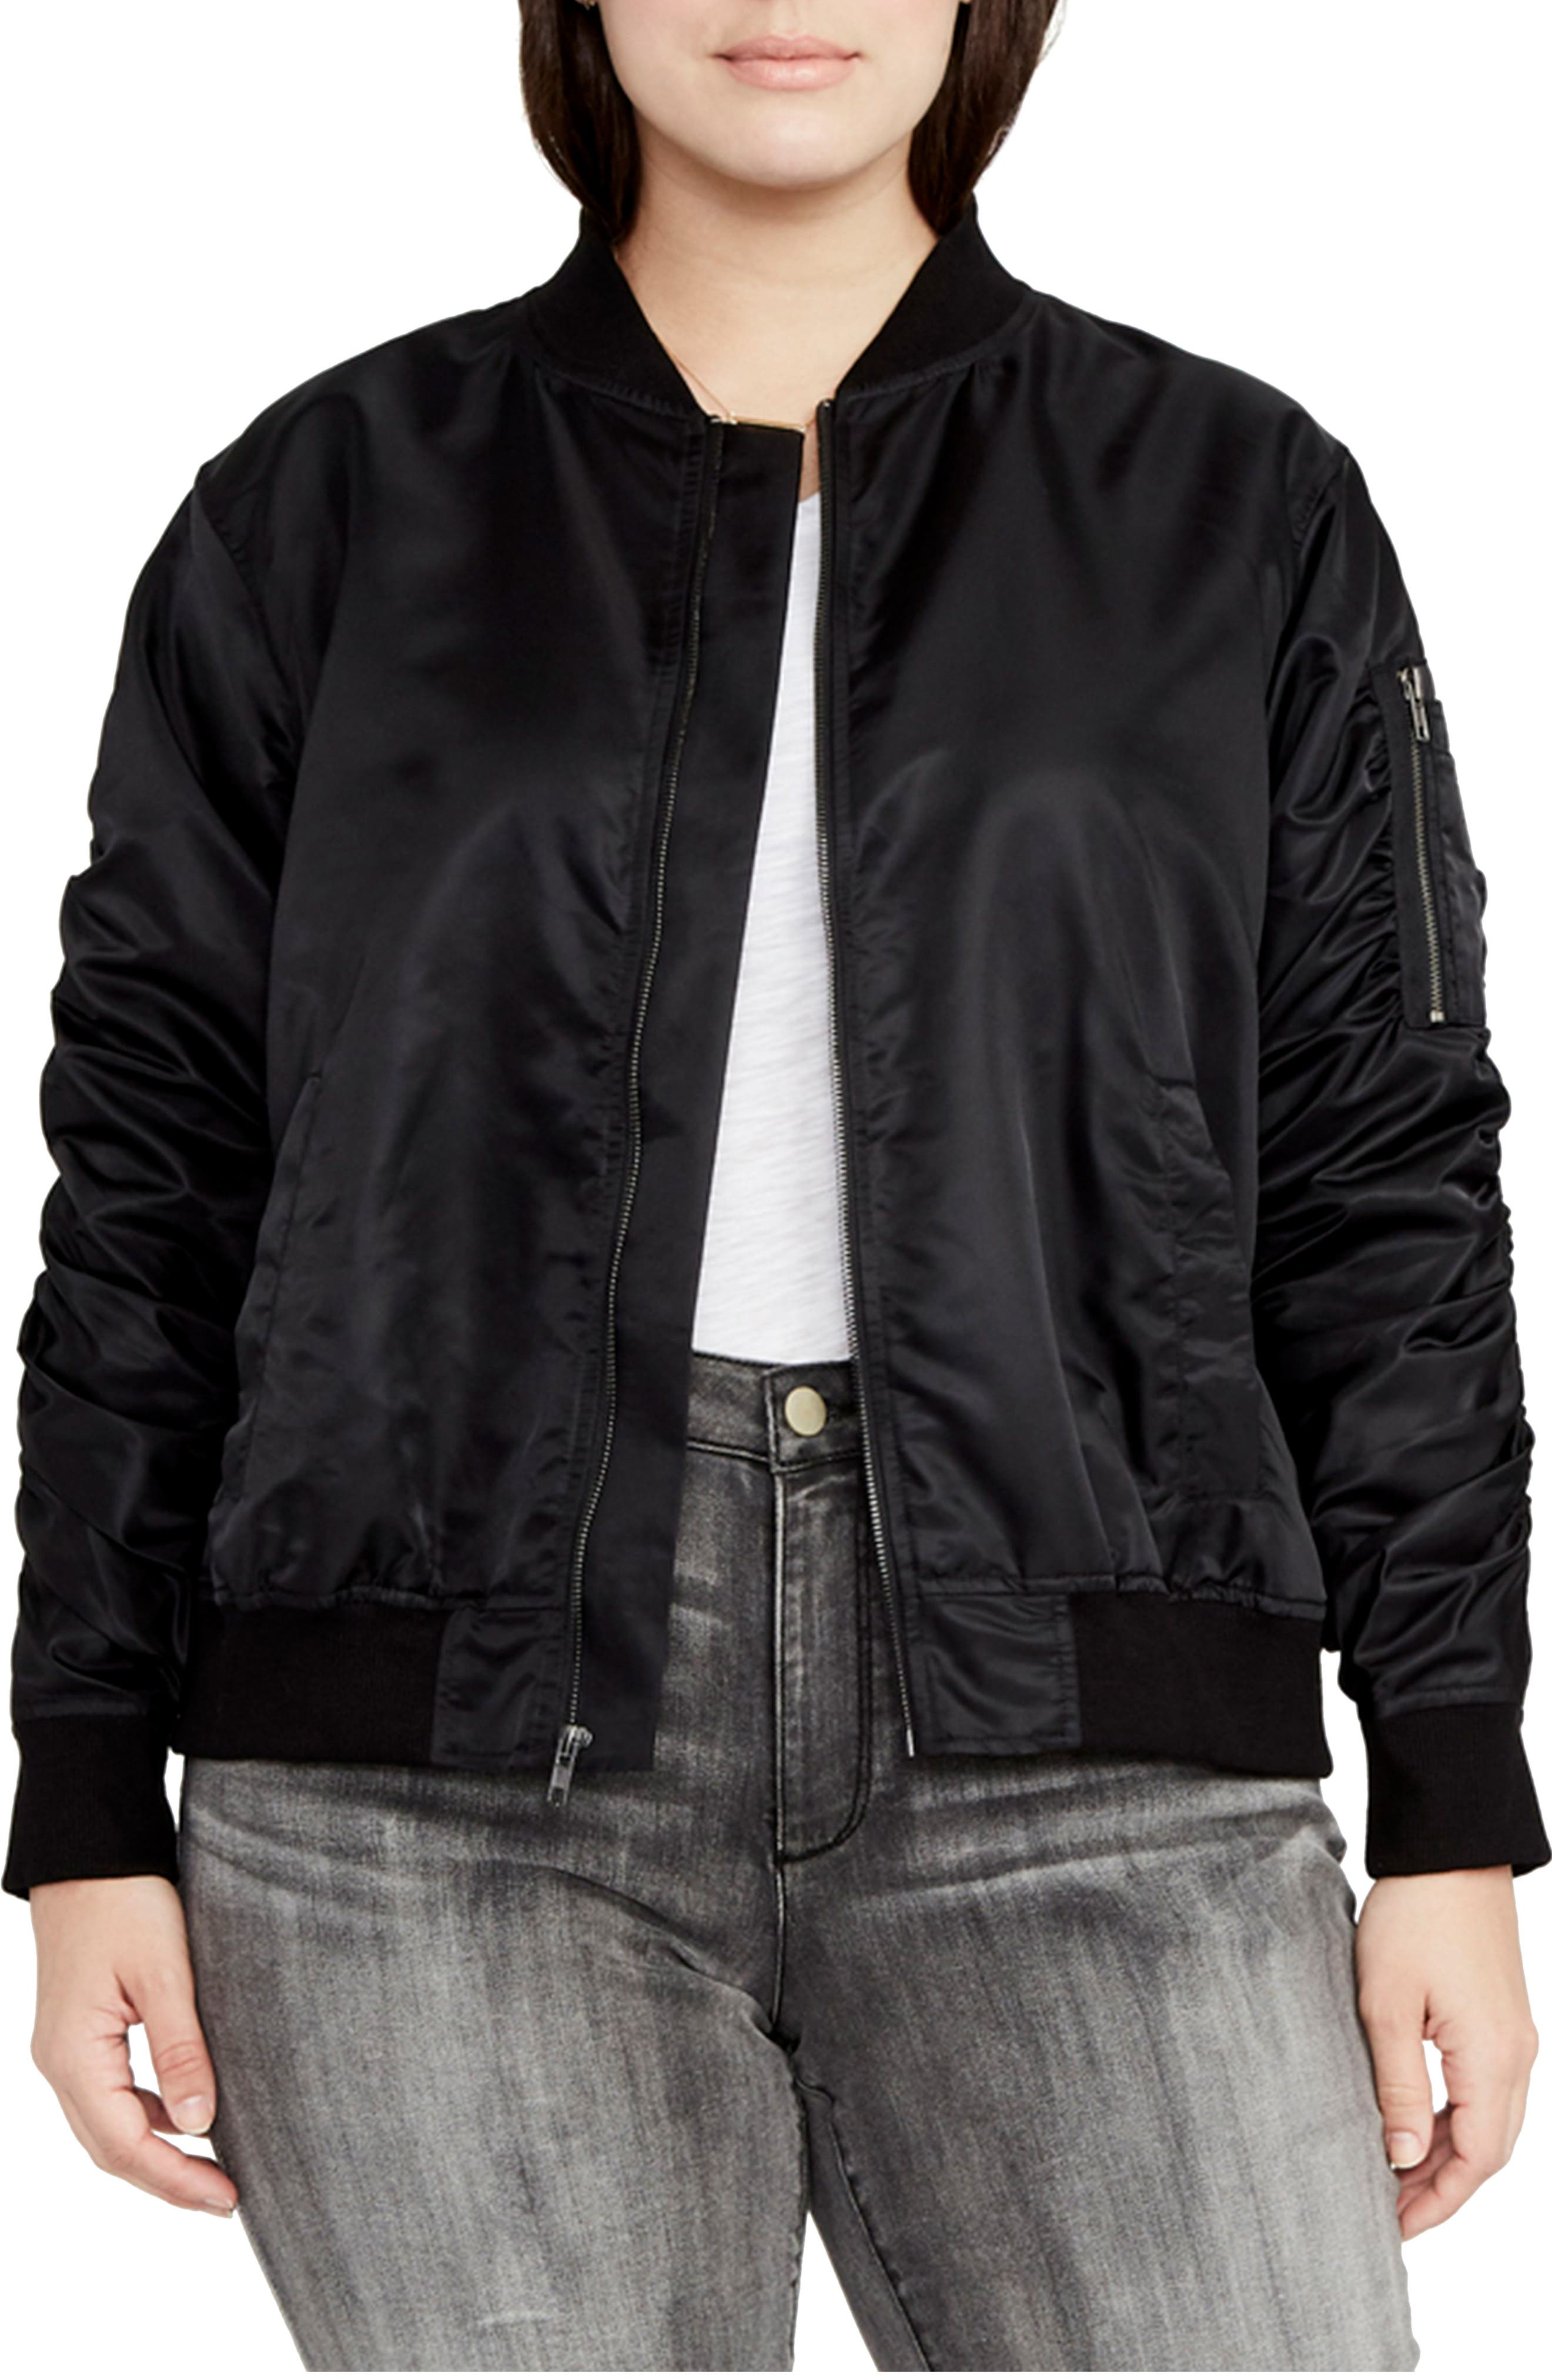 Alternate Image 1 Selected - RACHEL Rachel Roy Nylon Bomber Jacket (Plus Size)